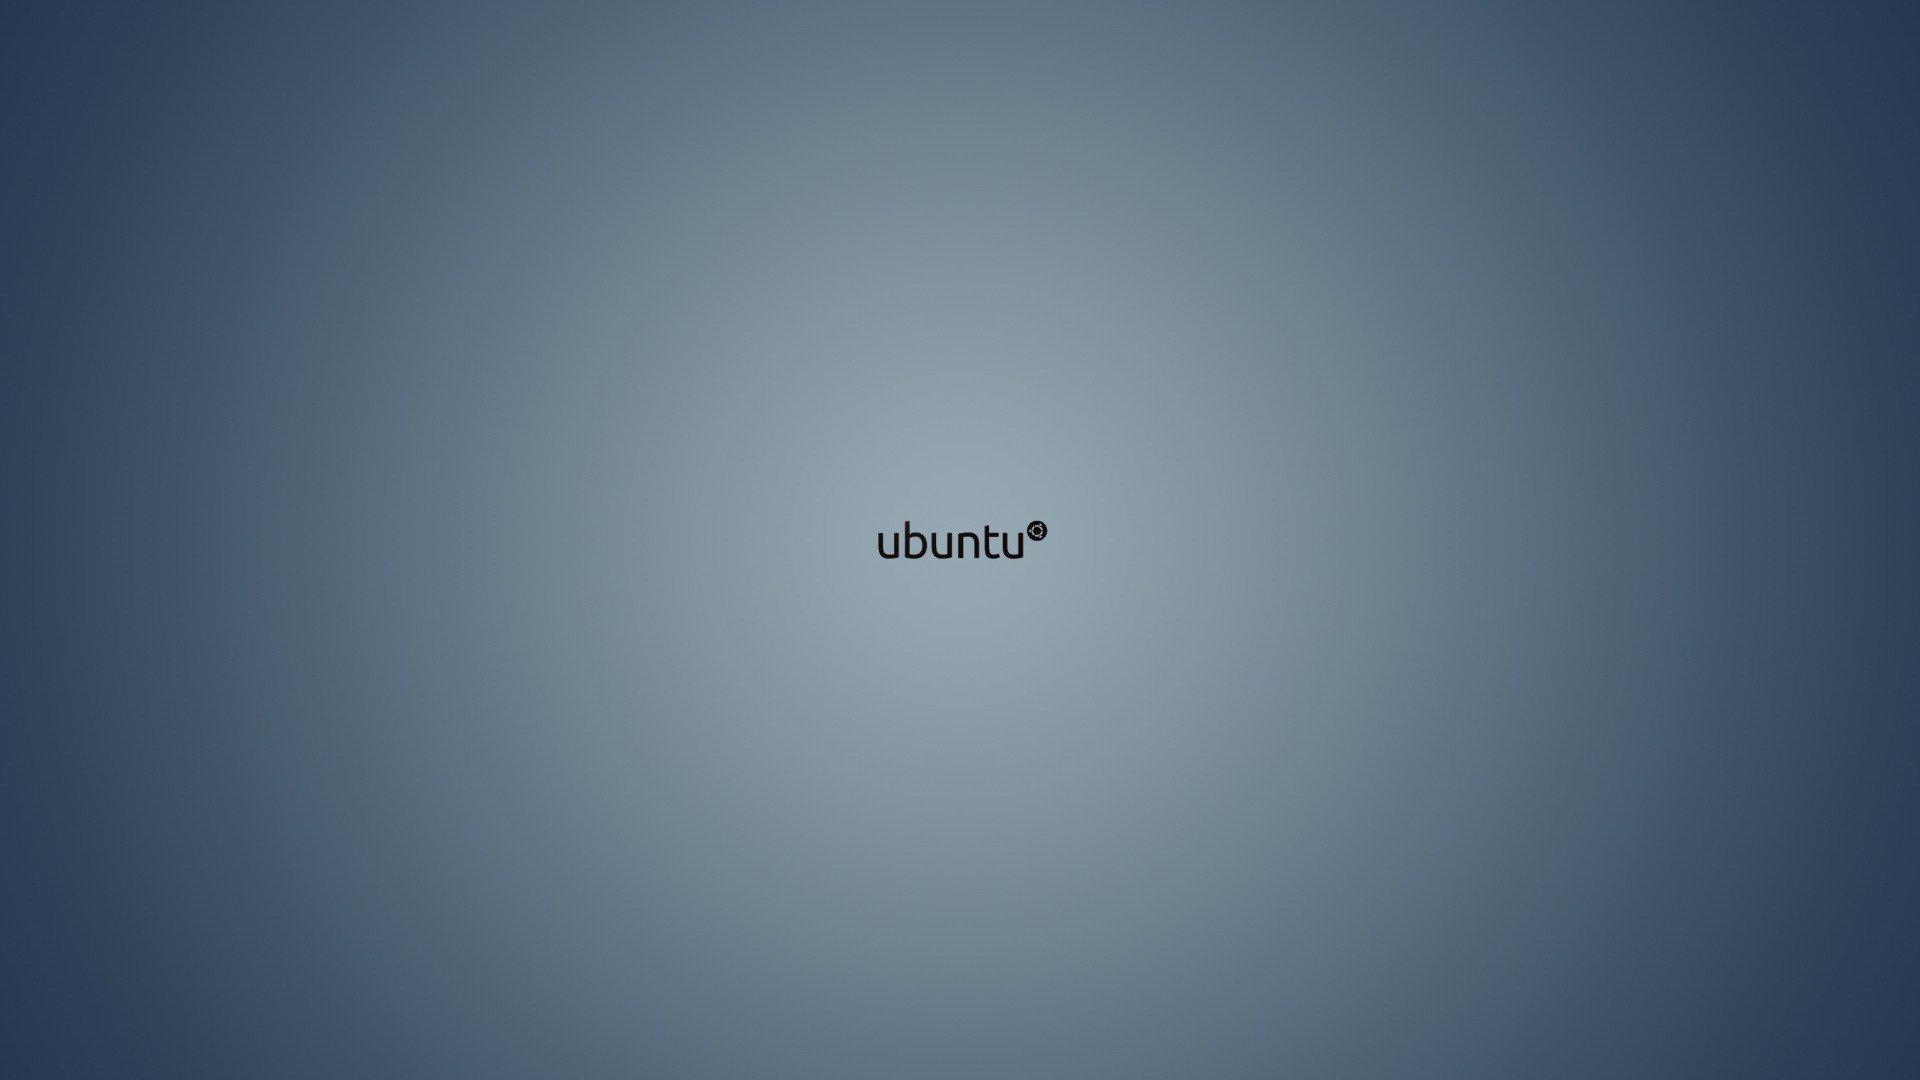 Ubuntu full hd fondo de pantalla and fondo de escritorio for Fondo de pantalla ubuntu